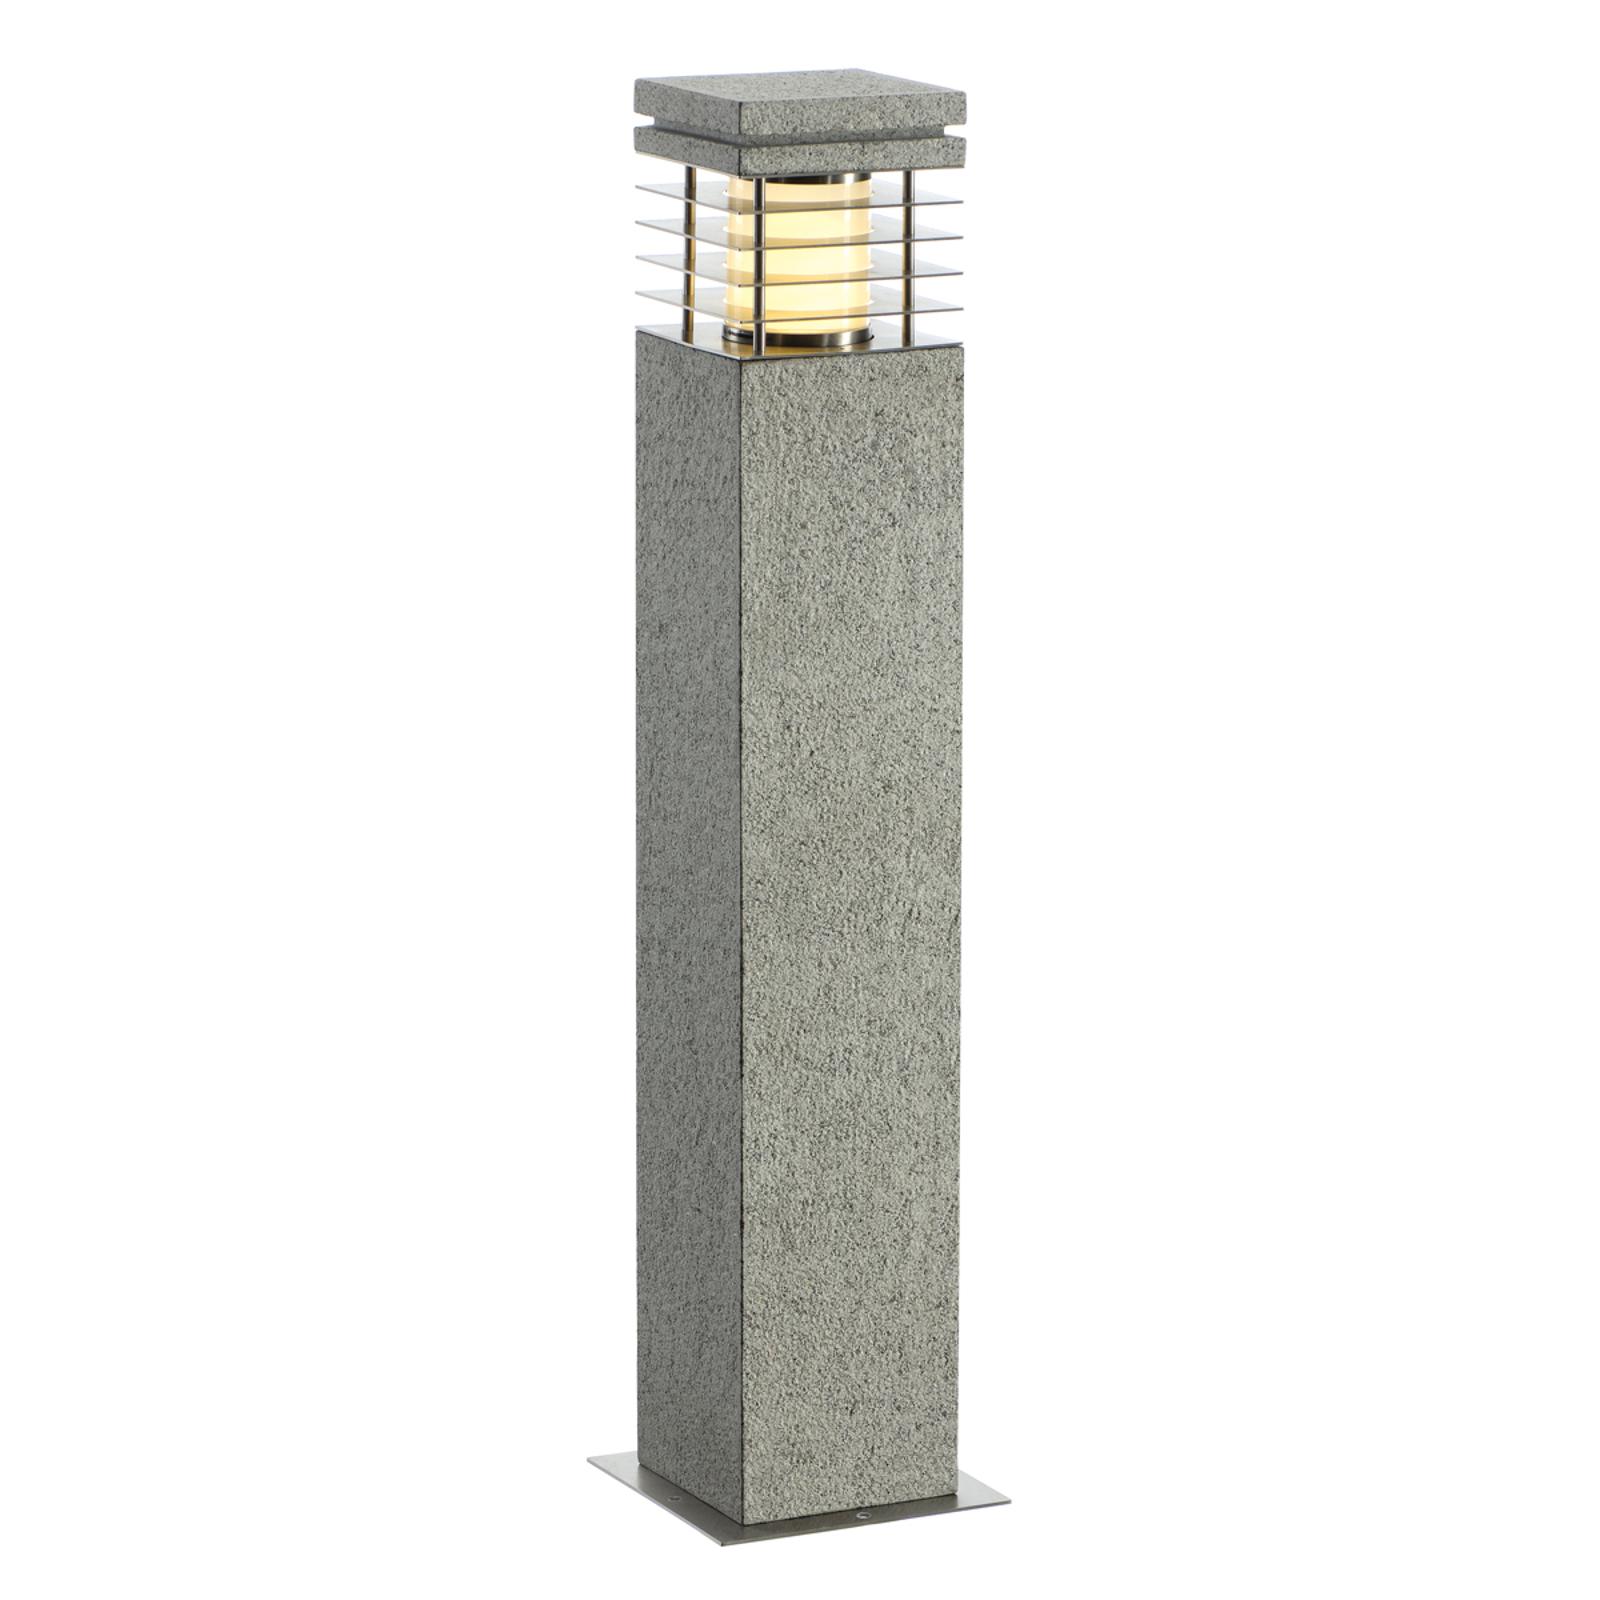 Arrock Sandstone Path Lamp in Granite Finish_5504319_1